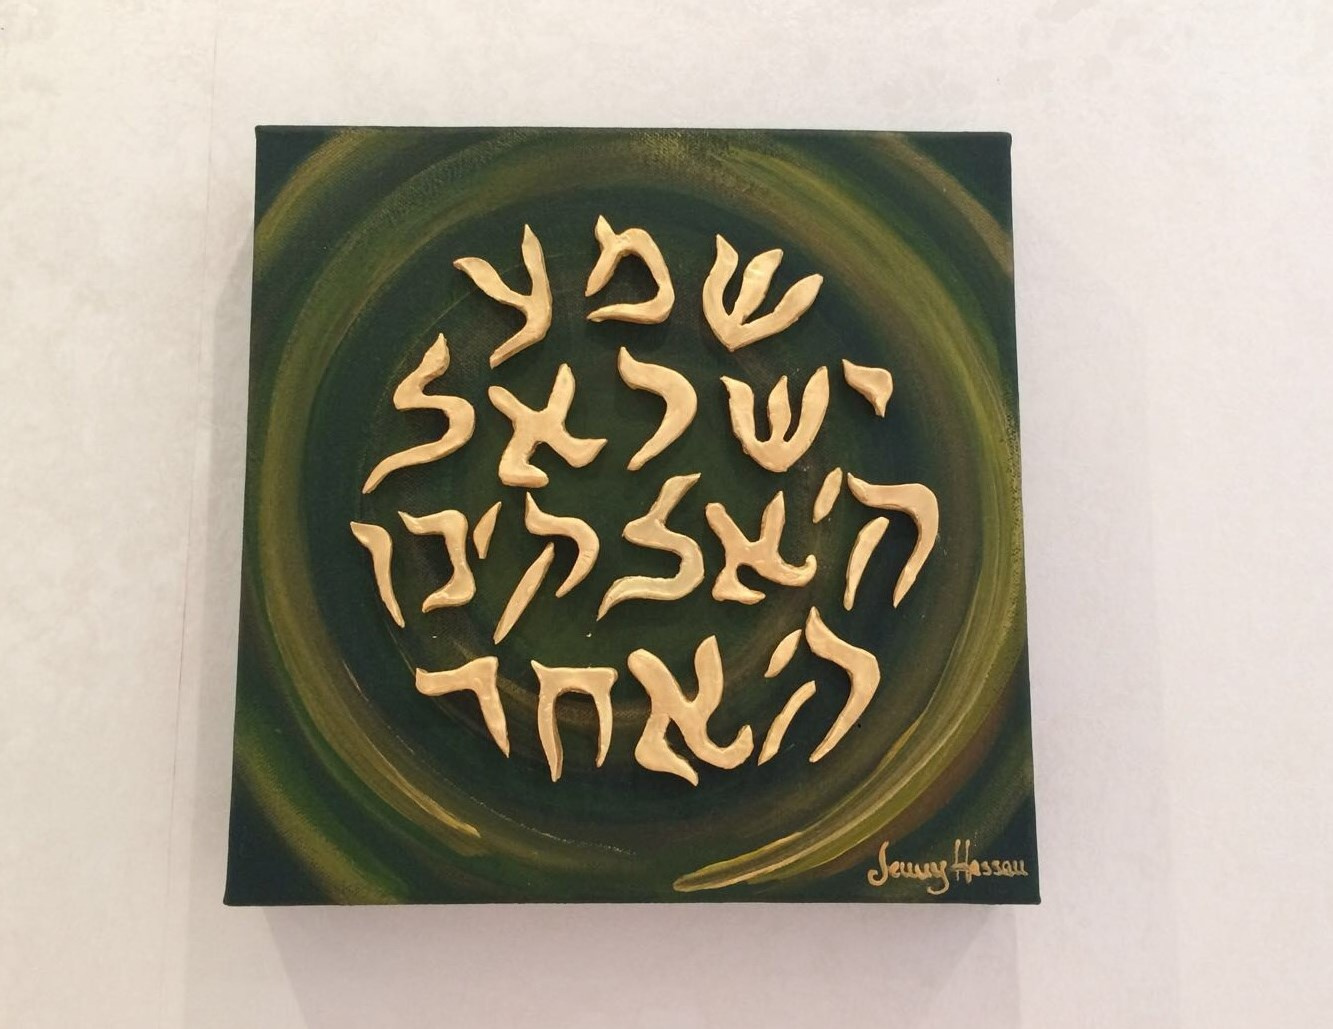 Shema Israel verde e oro